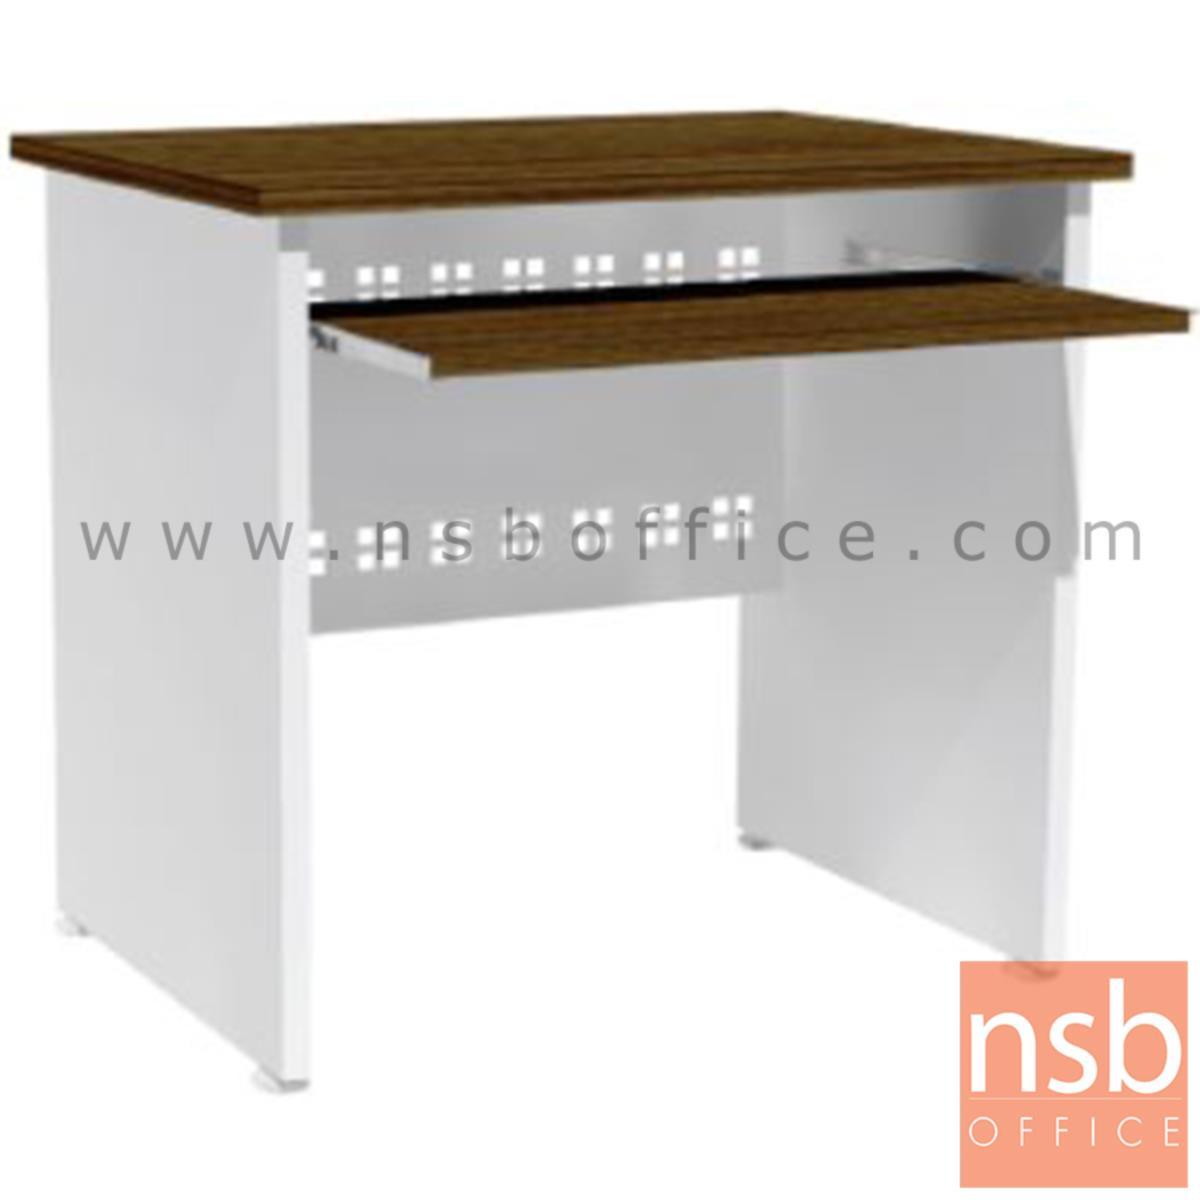 A34A026:โต๊ะคอมพิวเตอร์  รุ่น Luxyl (ลูซิล) ขนาด 80W cm. พร้อมรางคีบอร์ด บังโป๊เหล็ก สีซีบราโน่-ขาว